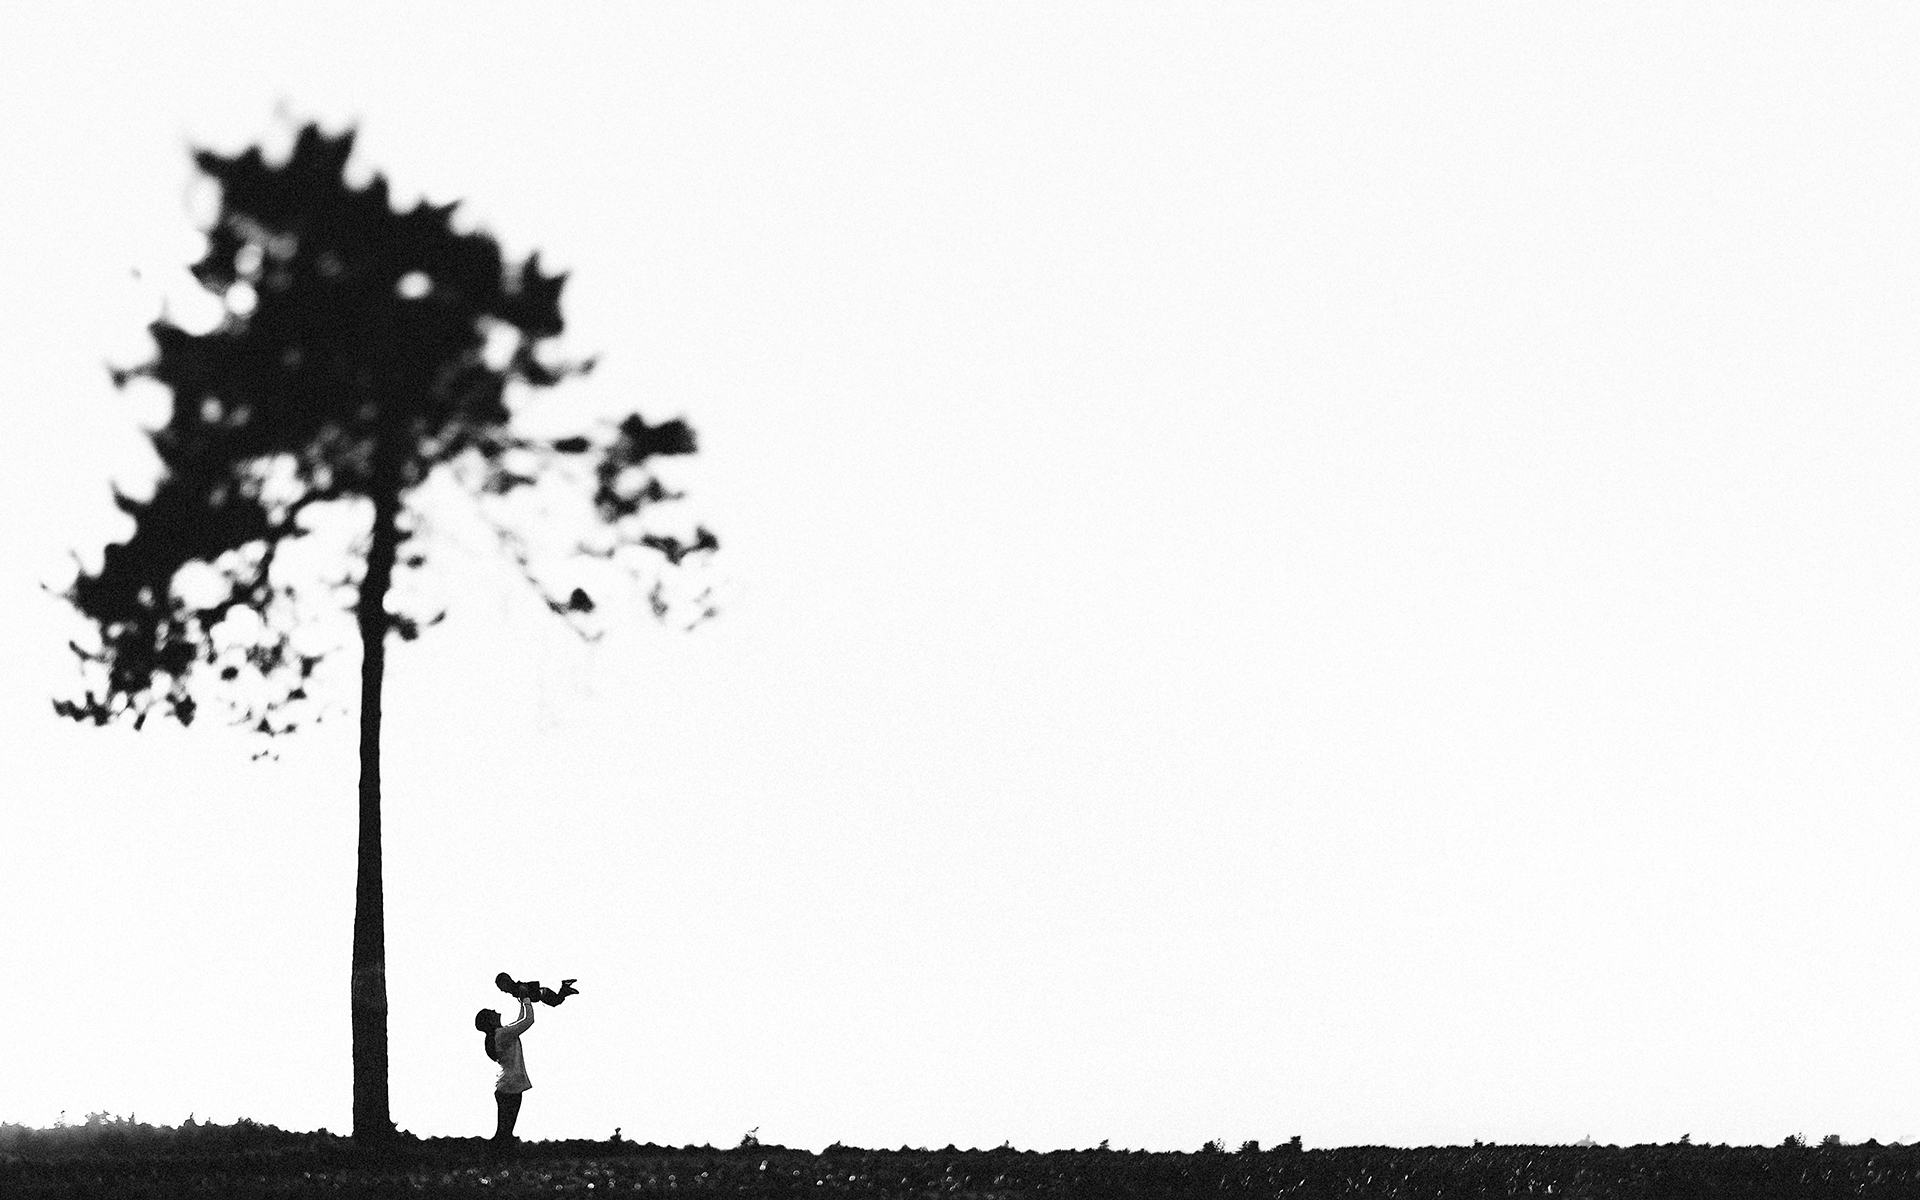 sandi-luke-maine-tree-1.jpg